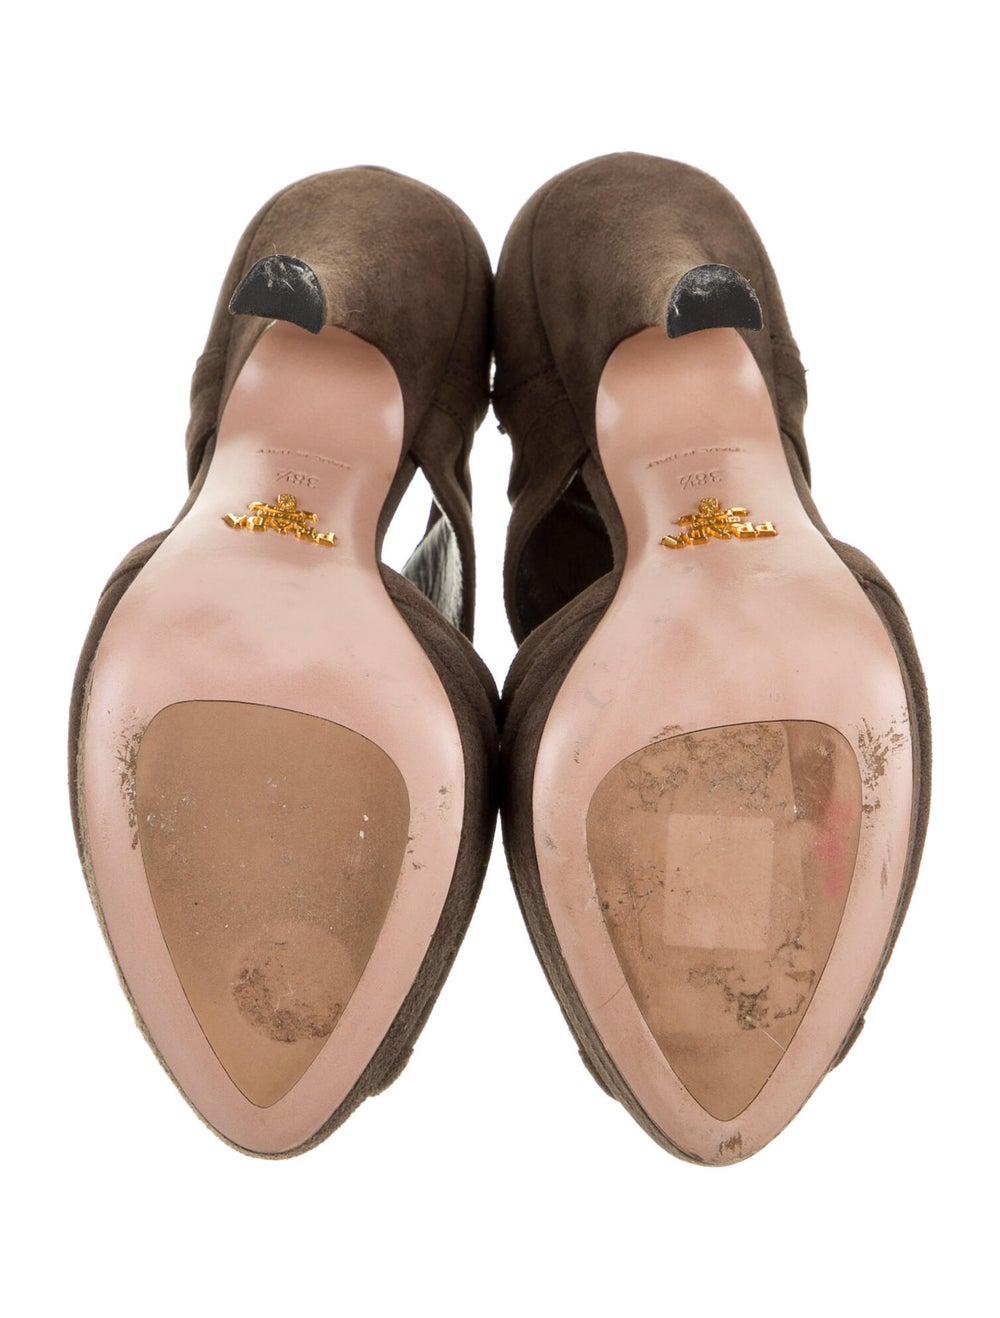 Prada Suede Sandals Brown - image 5